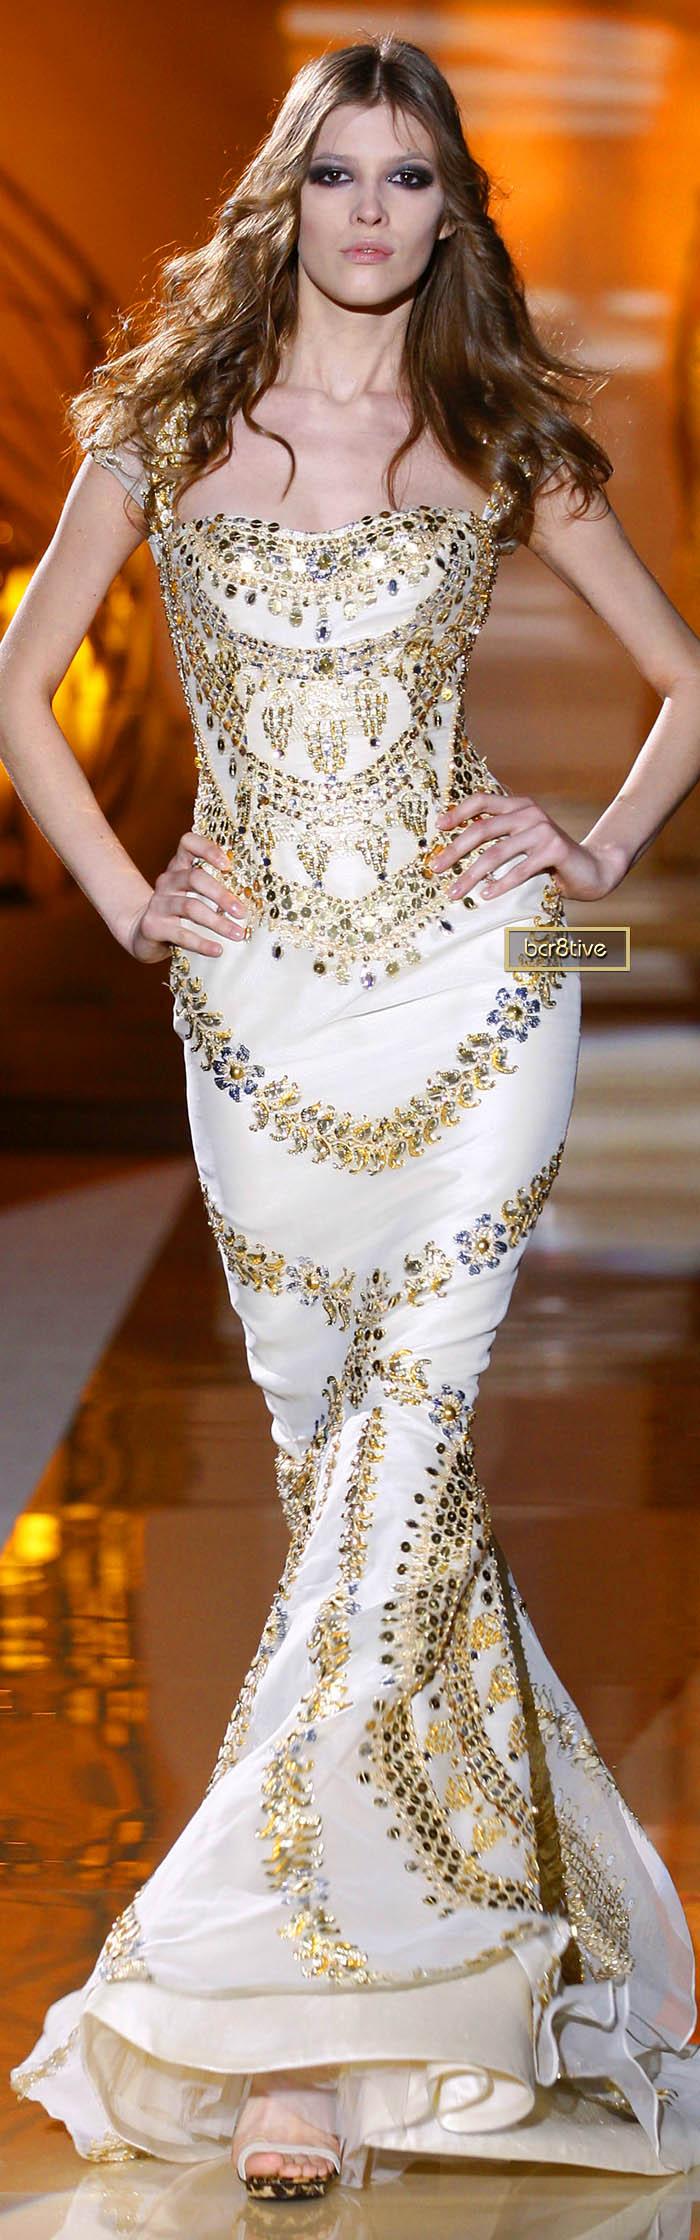 Zuhair Murad Haute Couture Spring Summer 2011